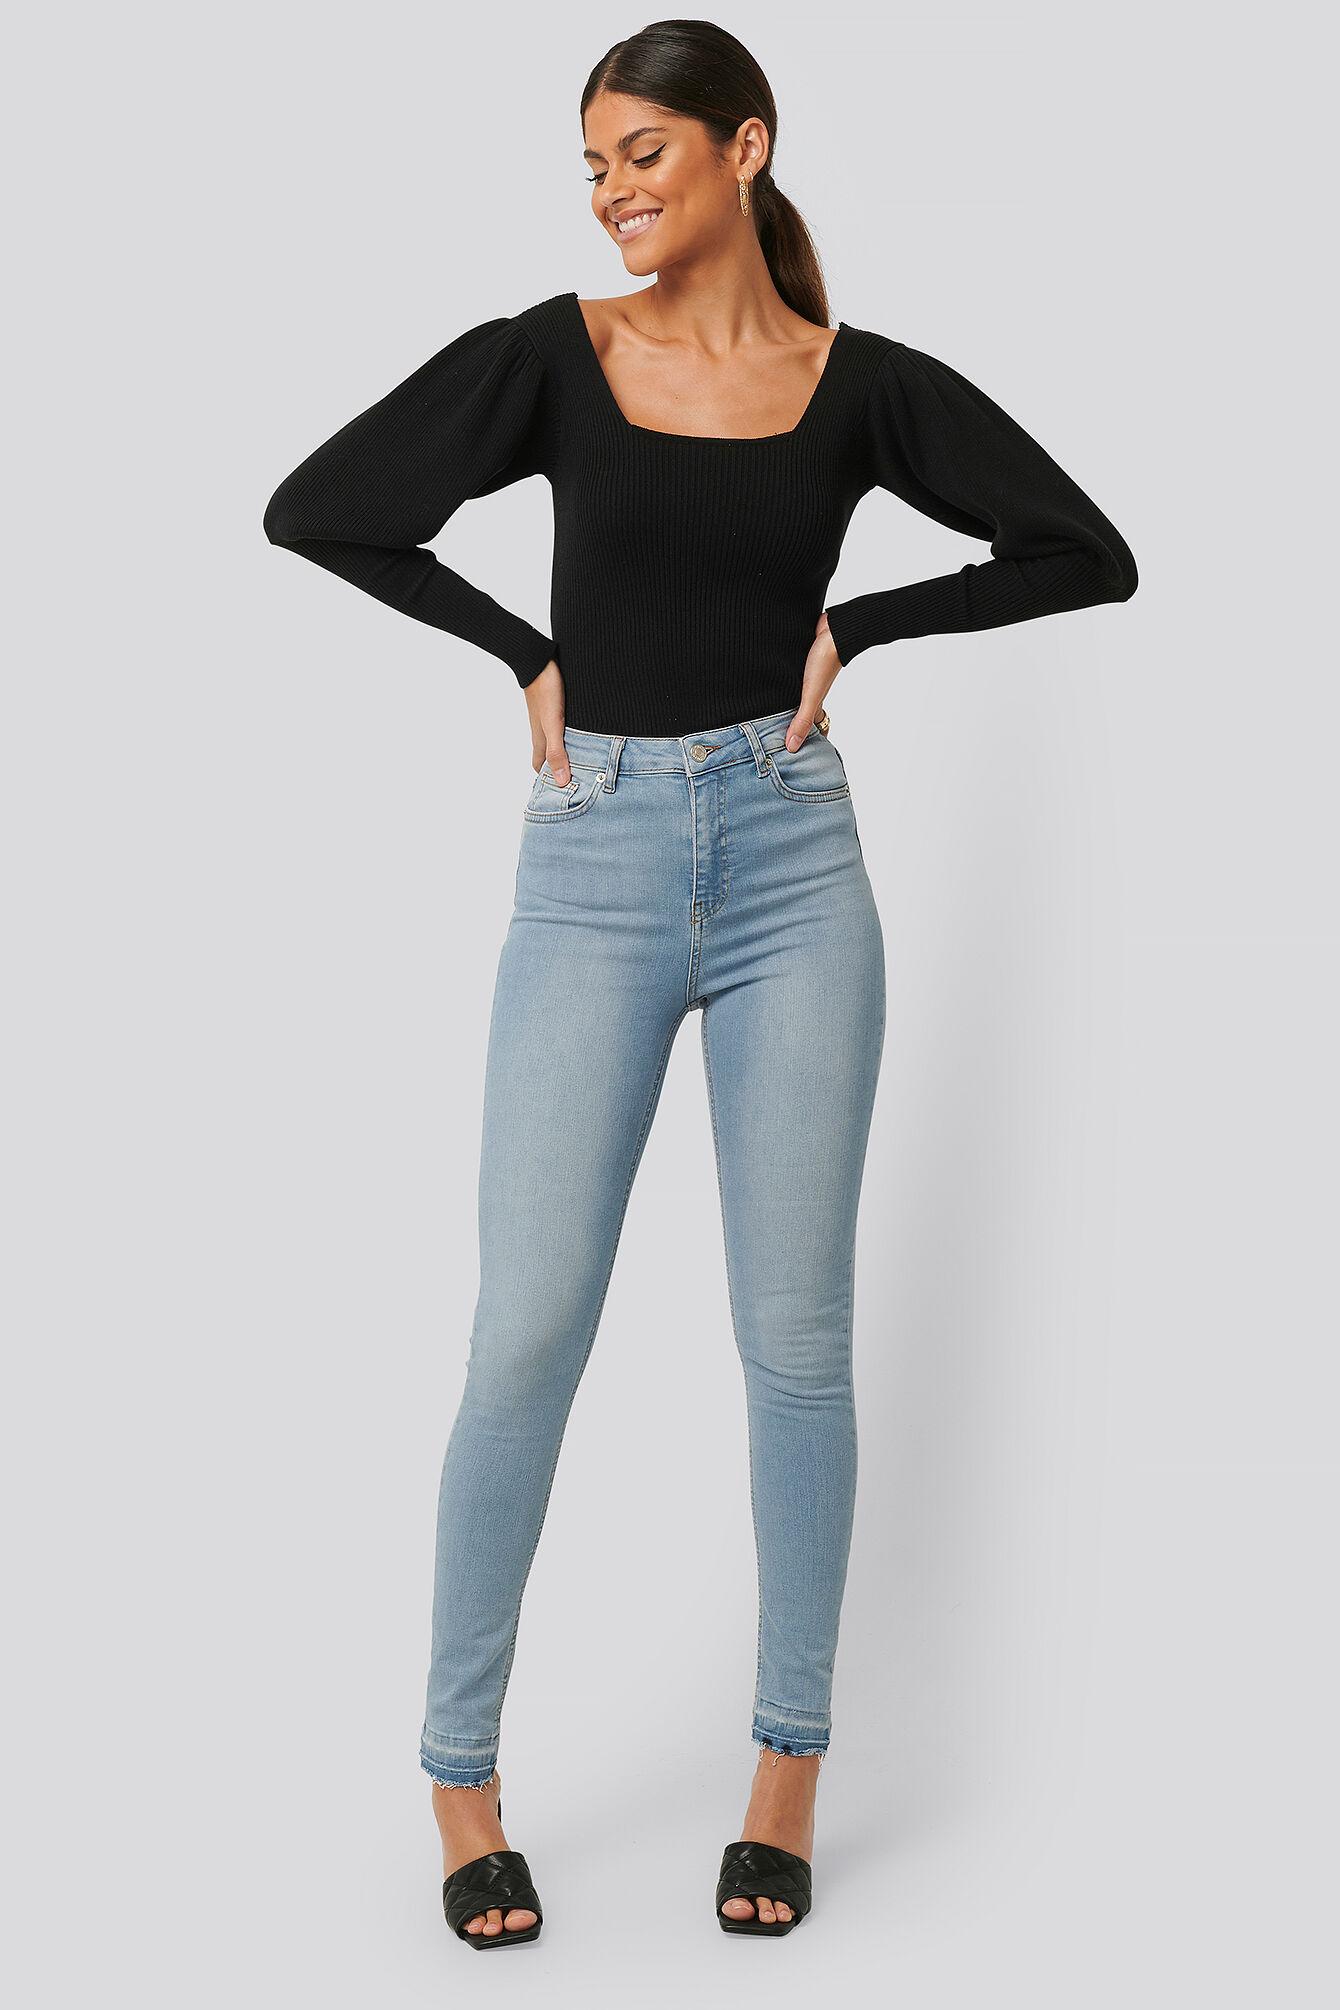 NA-KD Skinny High Waist Open Hem Jeans Tall - Blue  - Size: EU 32,EU 34,EU 36,EU 38,EU 40,EU 42,EU 44